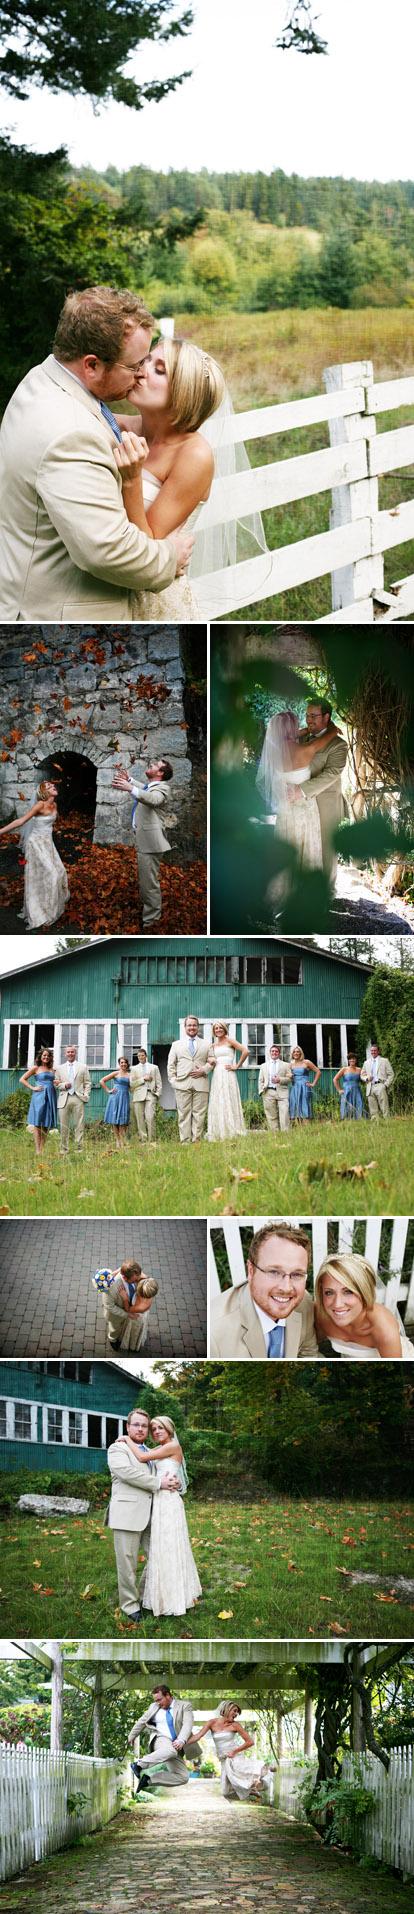 Casual Pacific Northwest San Juan Island wedding , fun wedding couple images by Riso Studio